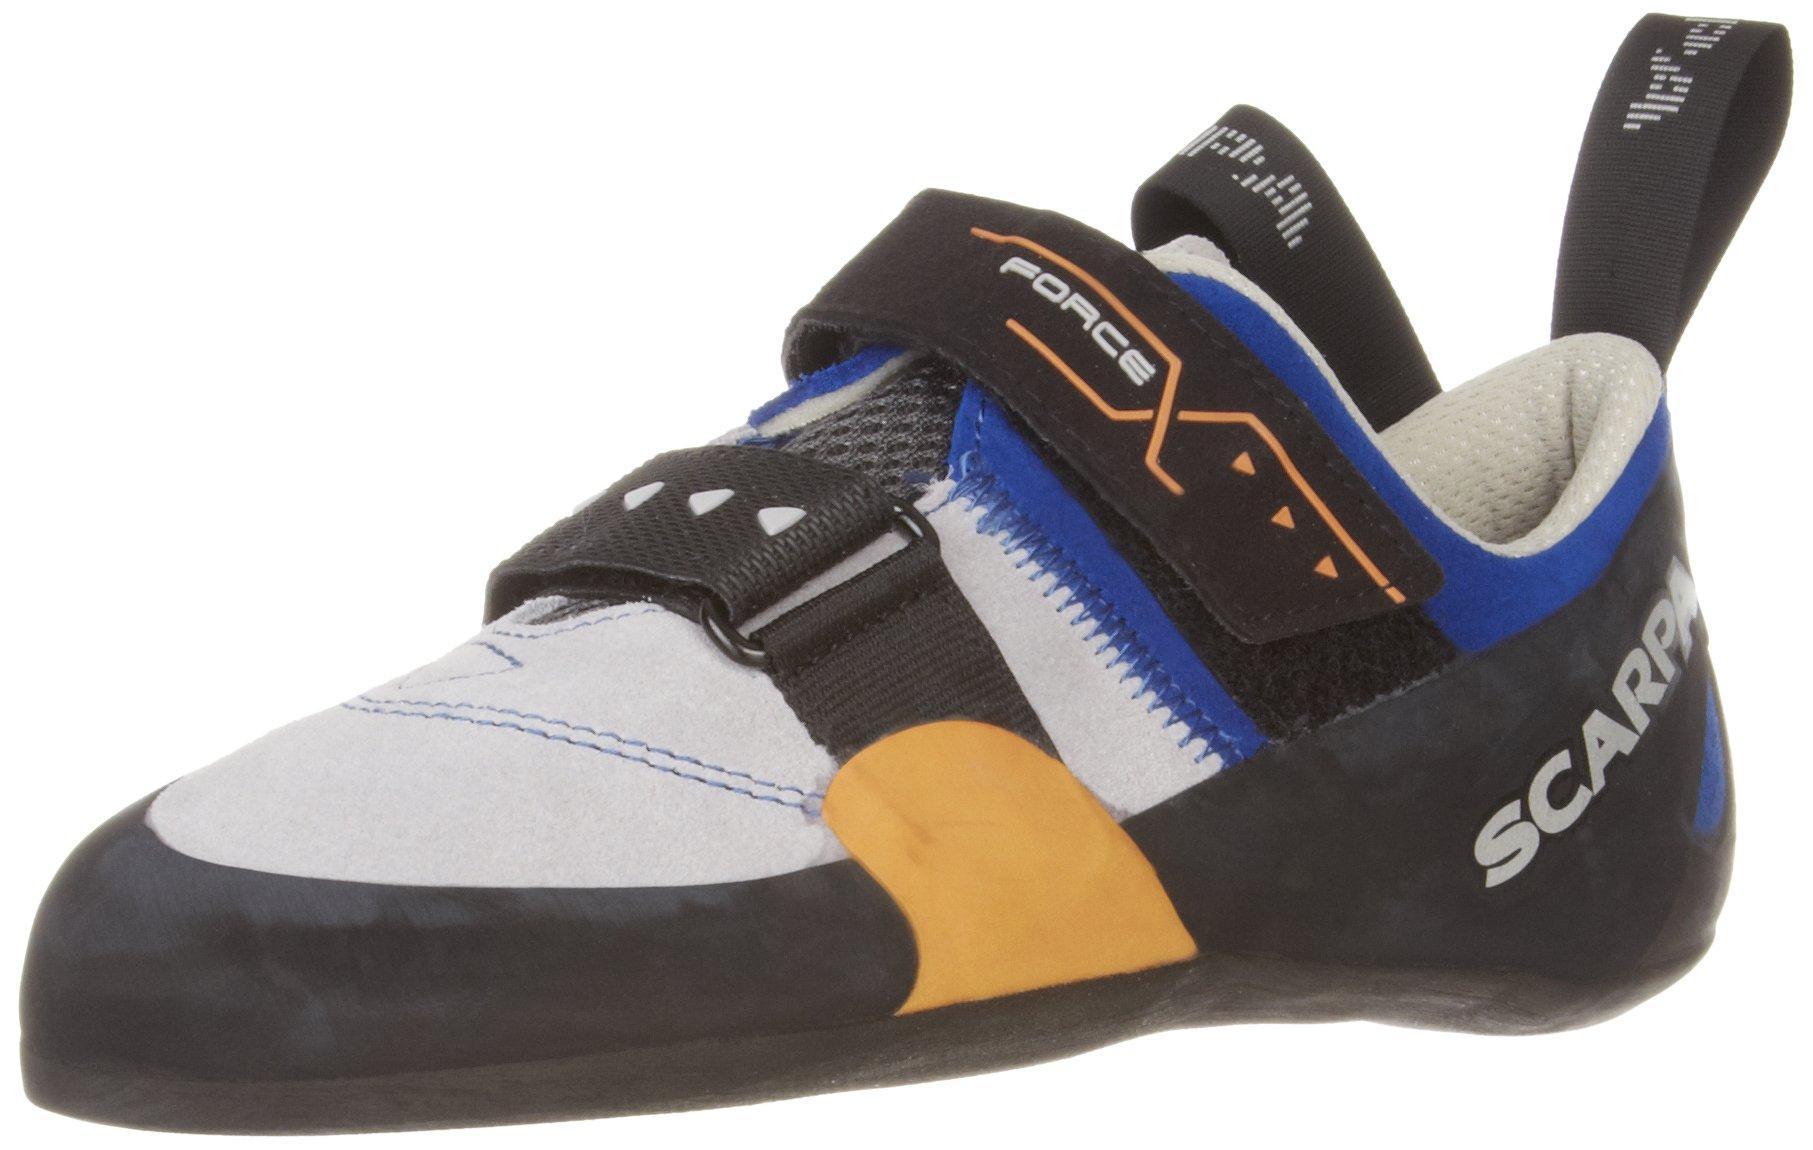 SCARPA Men's Force X Climbing Shoe,Imperial Blue,40 EU/7.5 M US